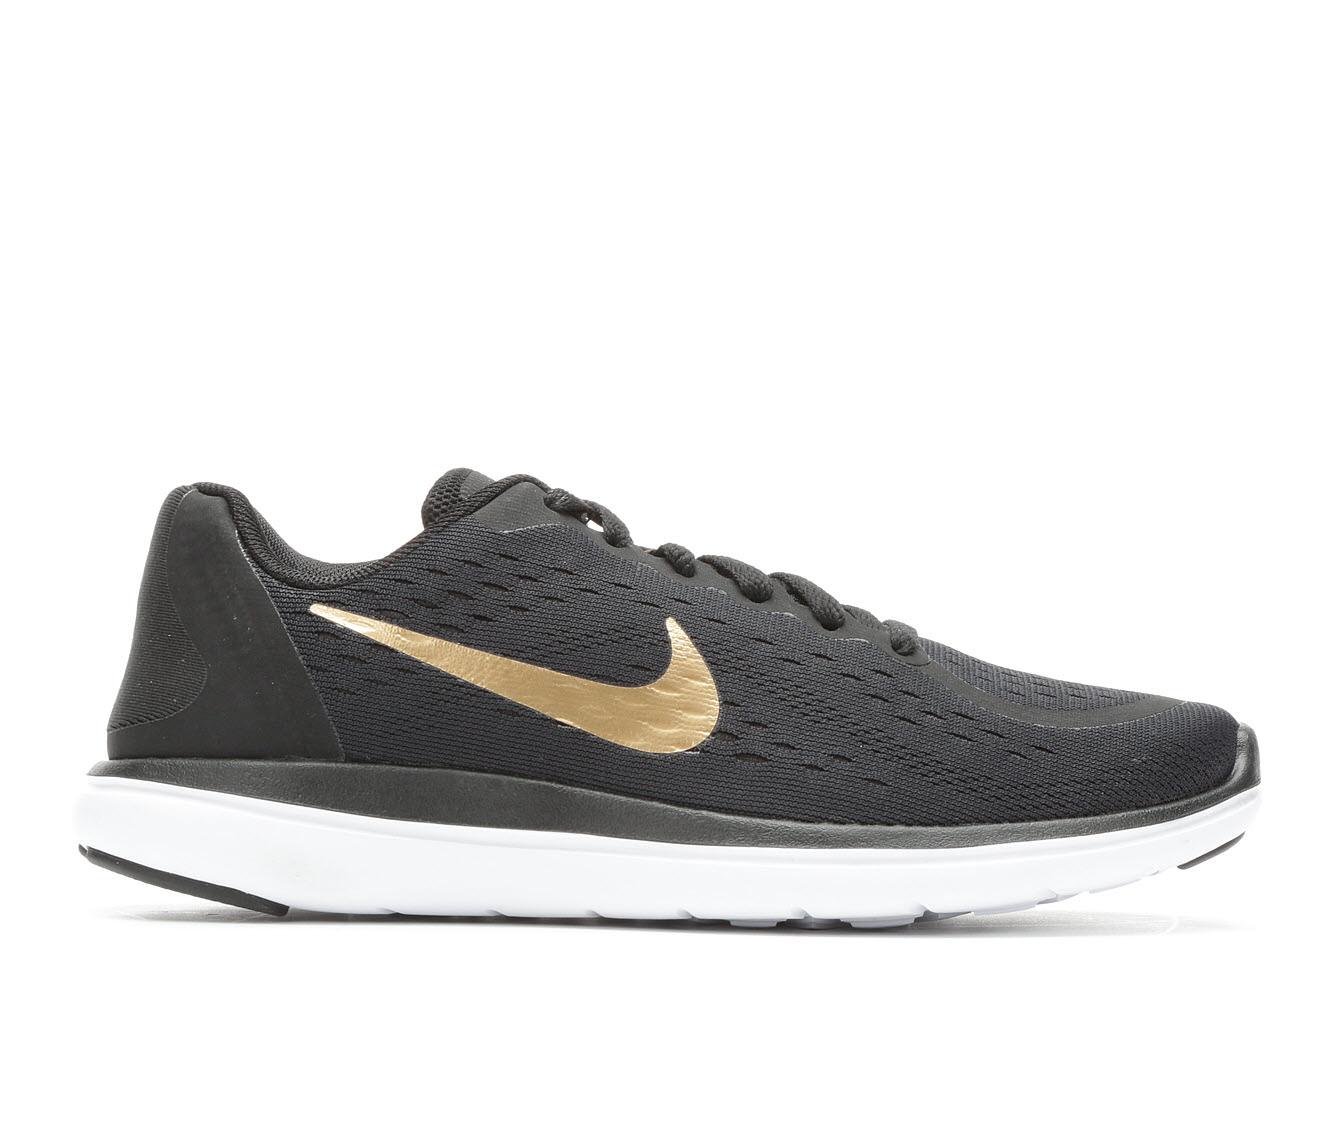 Boys' Nike Flex Run 2017 Running Shoes (Black)